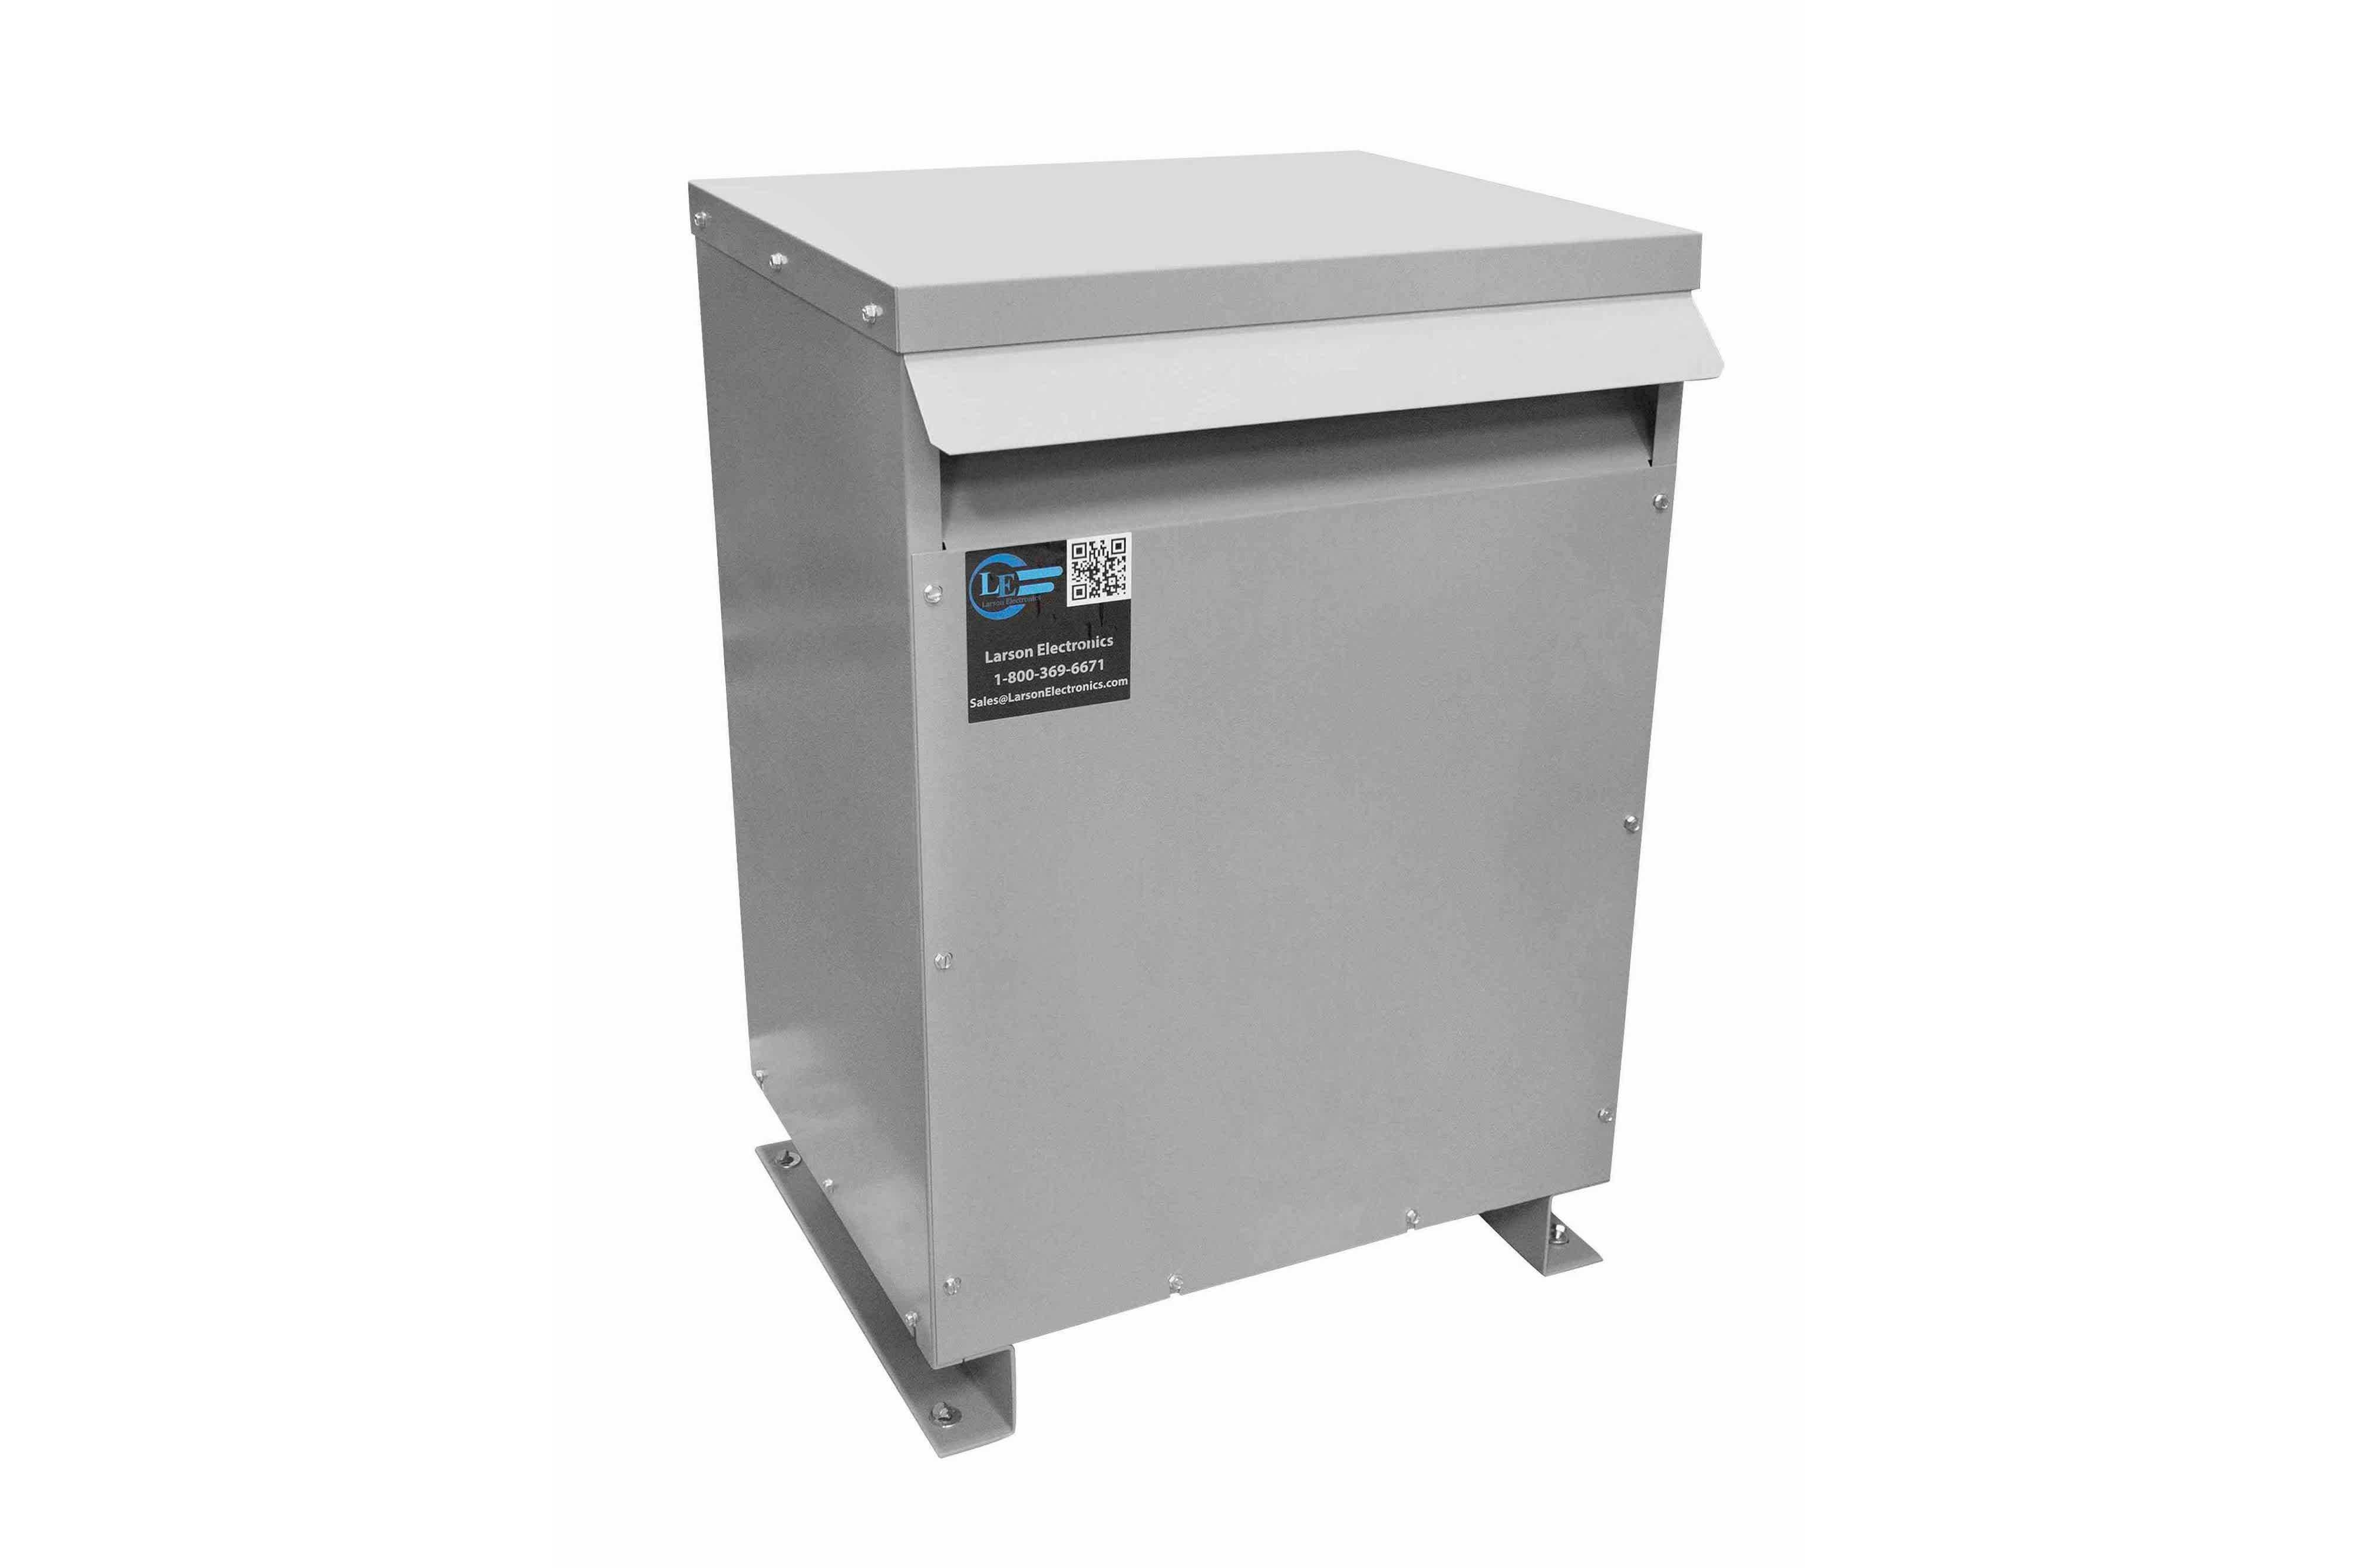 37.5 kVA 3PH Isolation Transformer, 575V Wye Primary, 415V Delta Secondary, N3R, Ventilated, 60 Hz